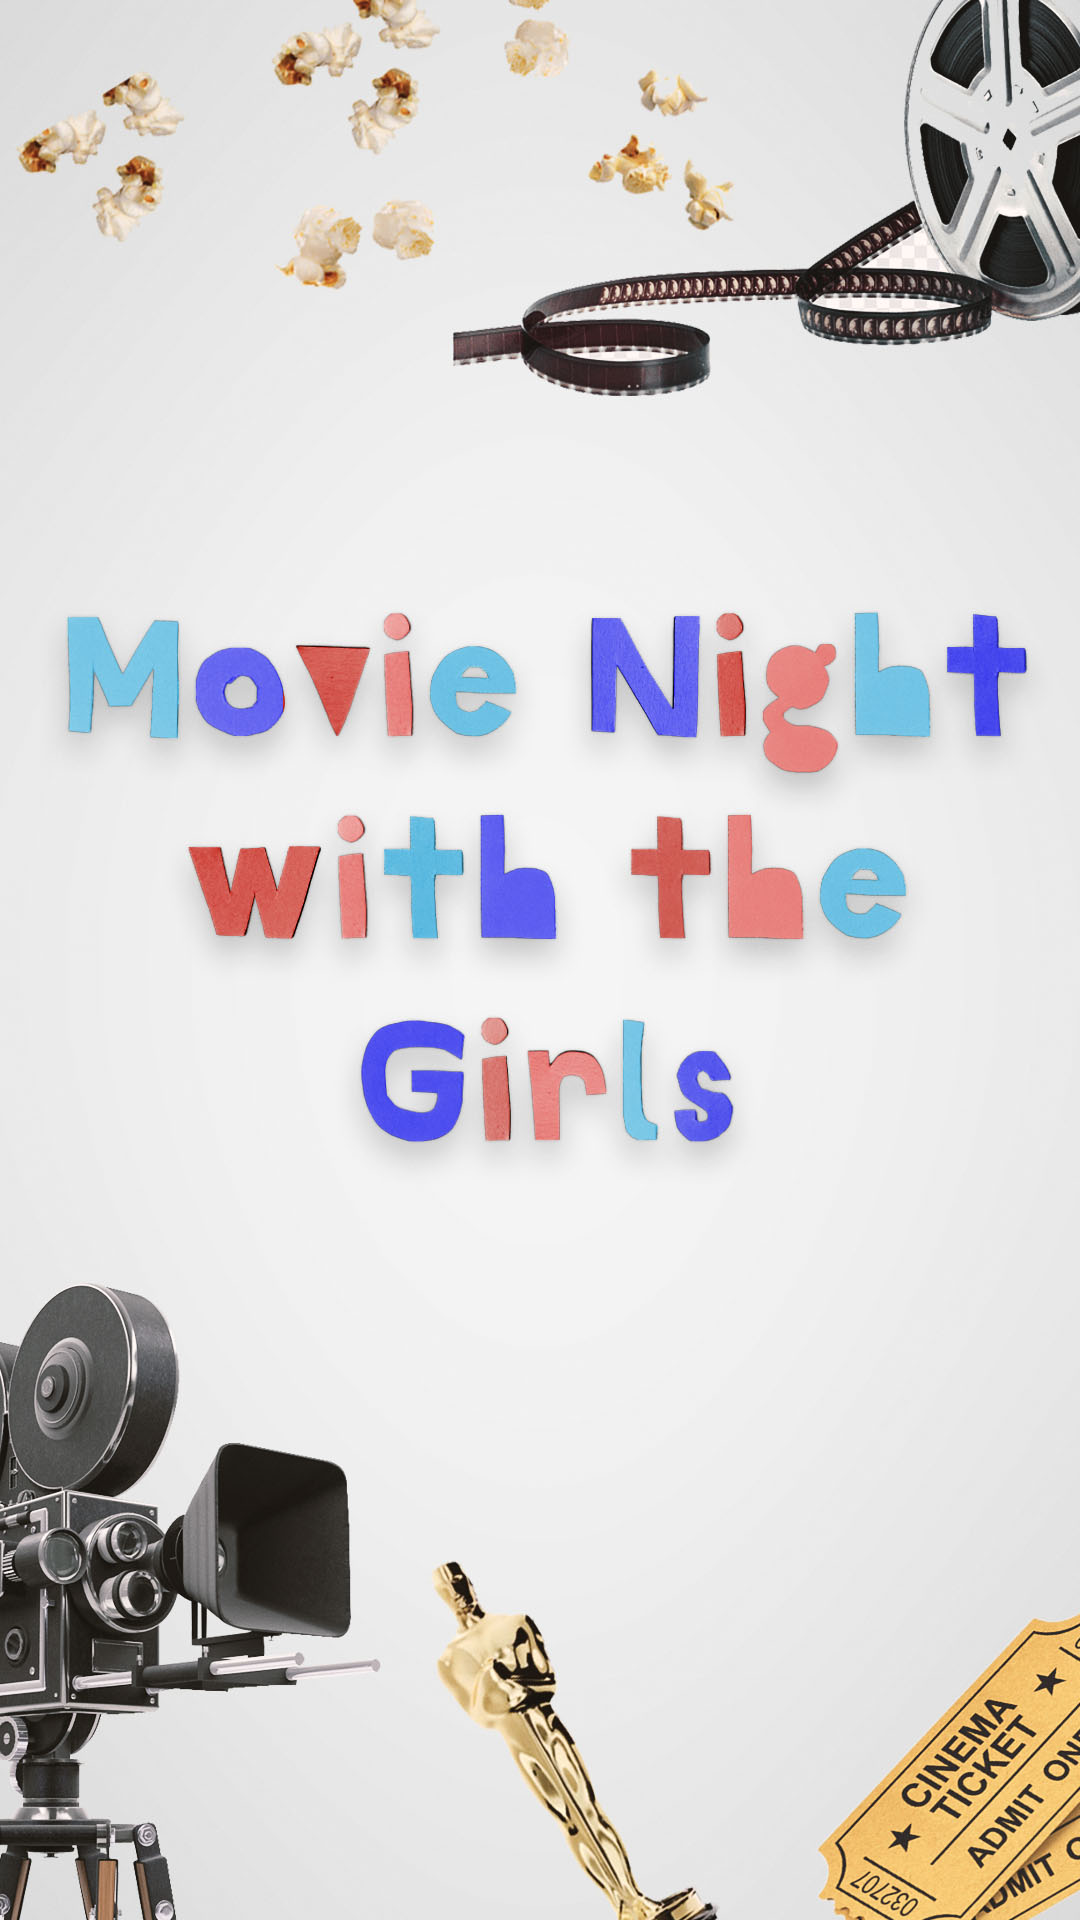 Next Level July 4th Social Media Posts1080x1920 Movie Night